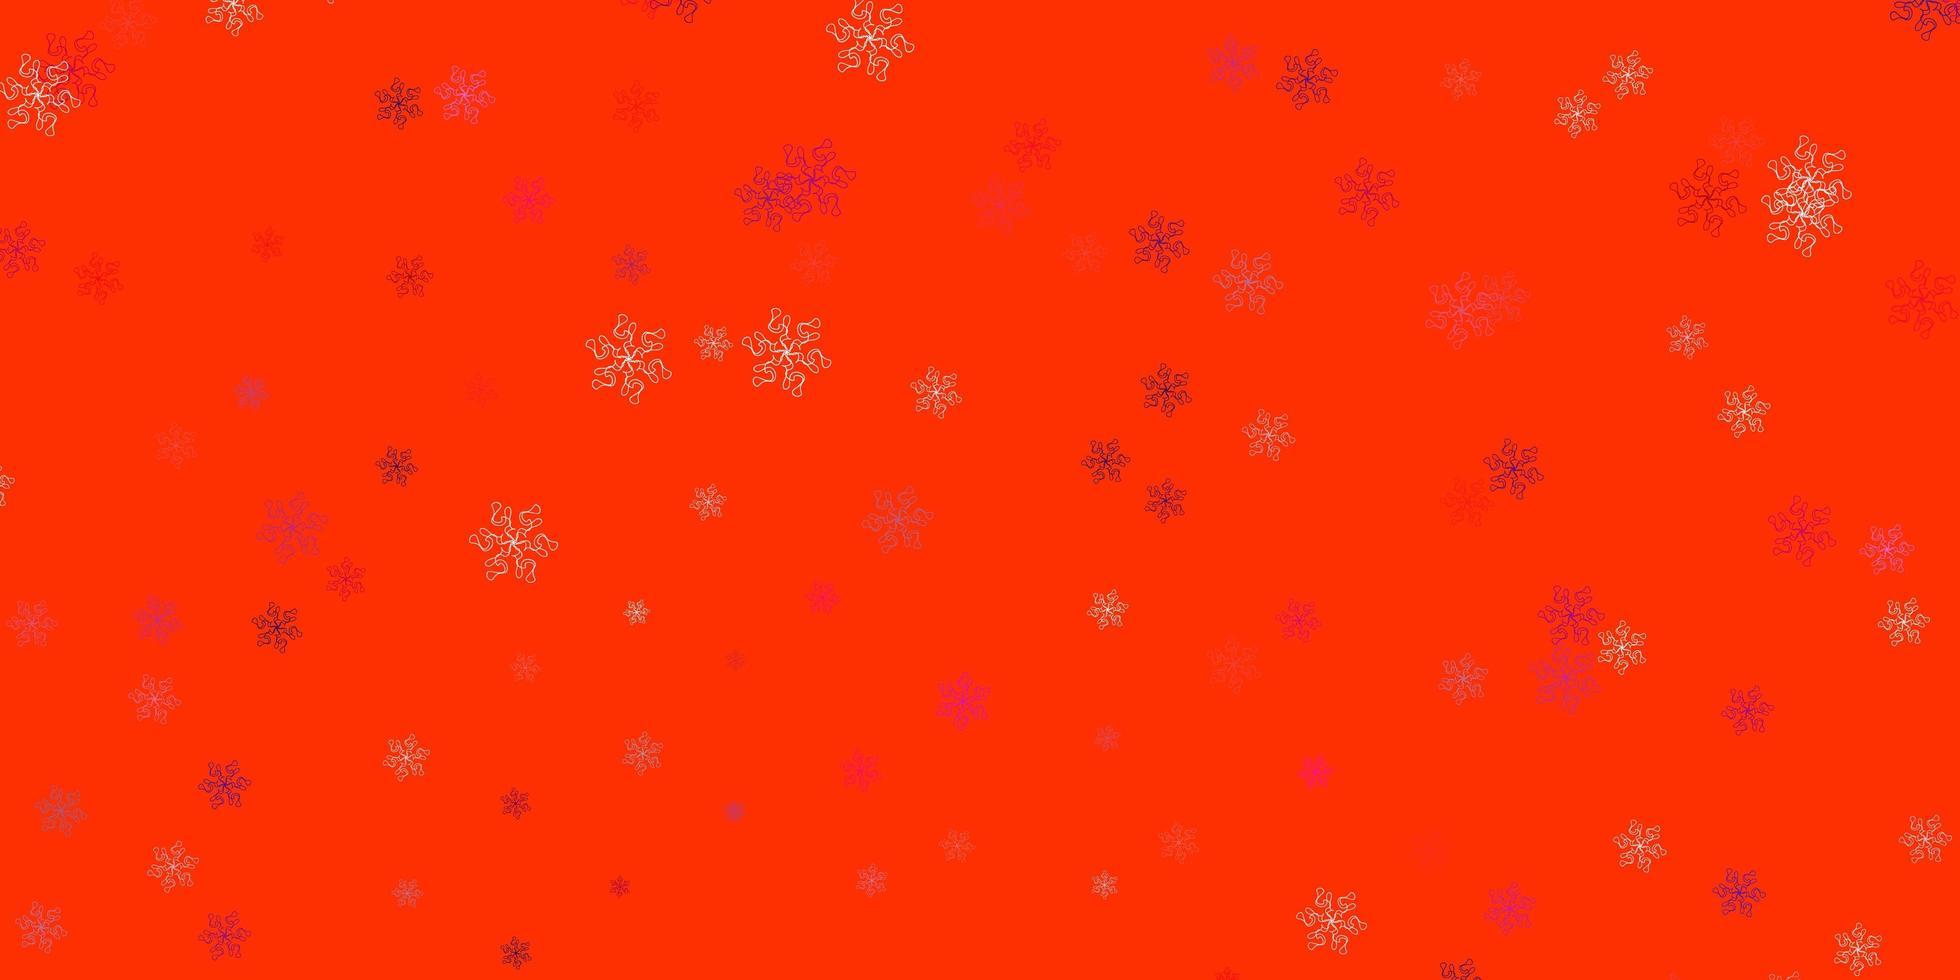 textura de doodle de vector rosa claro, rojo con flores.